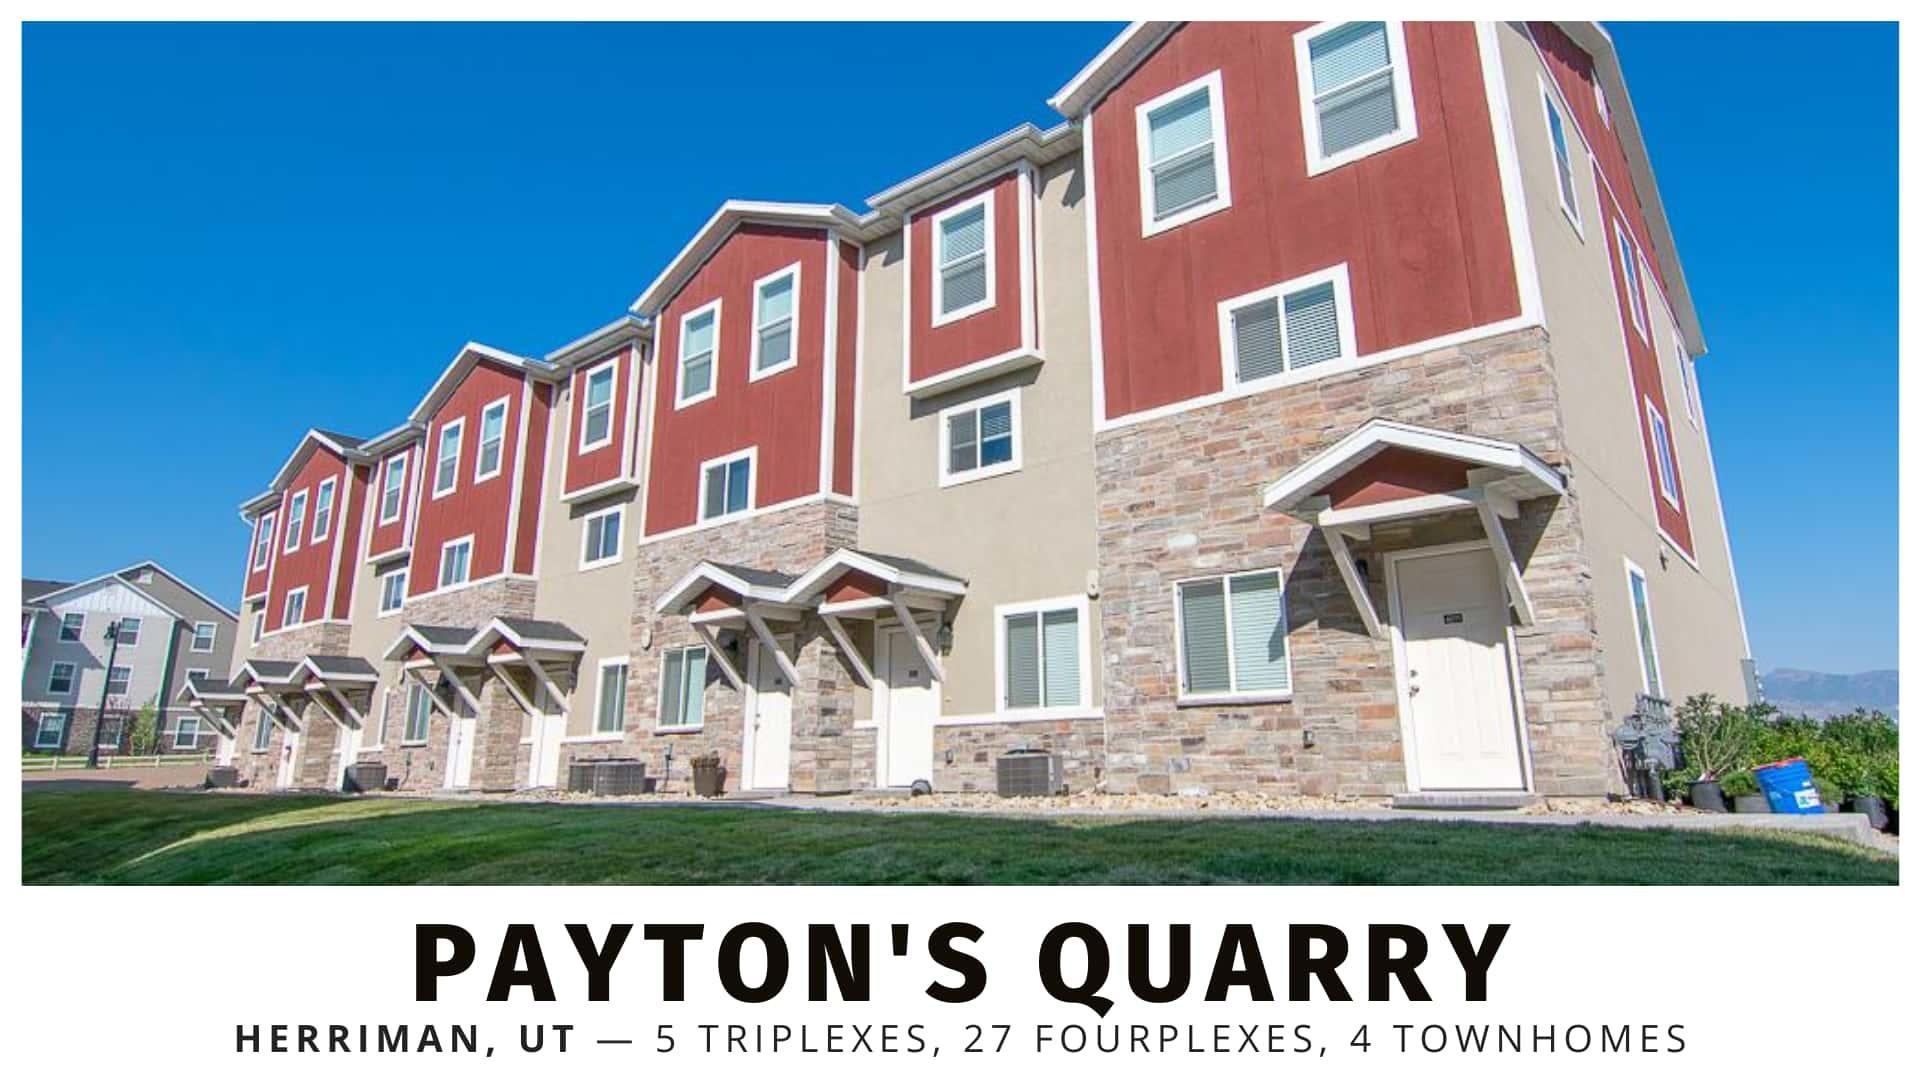 Payton's Quarry triplexes, fourplexes, and townhomes in Salt Lake County